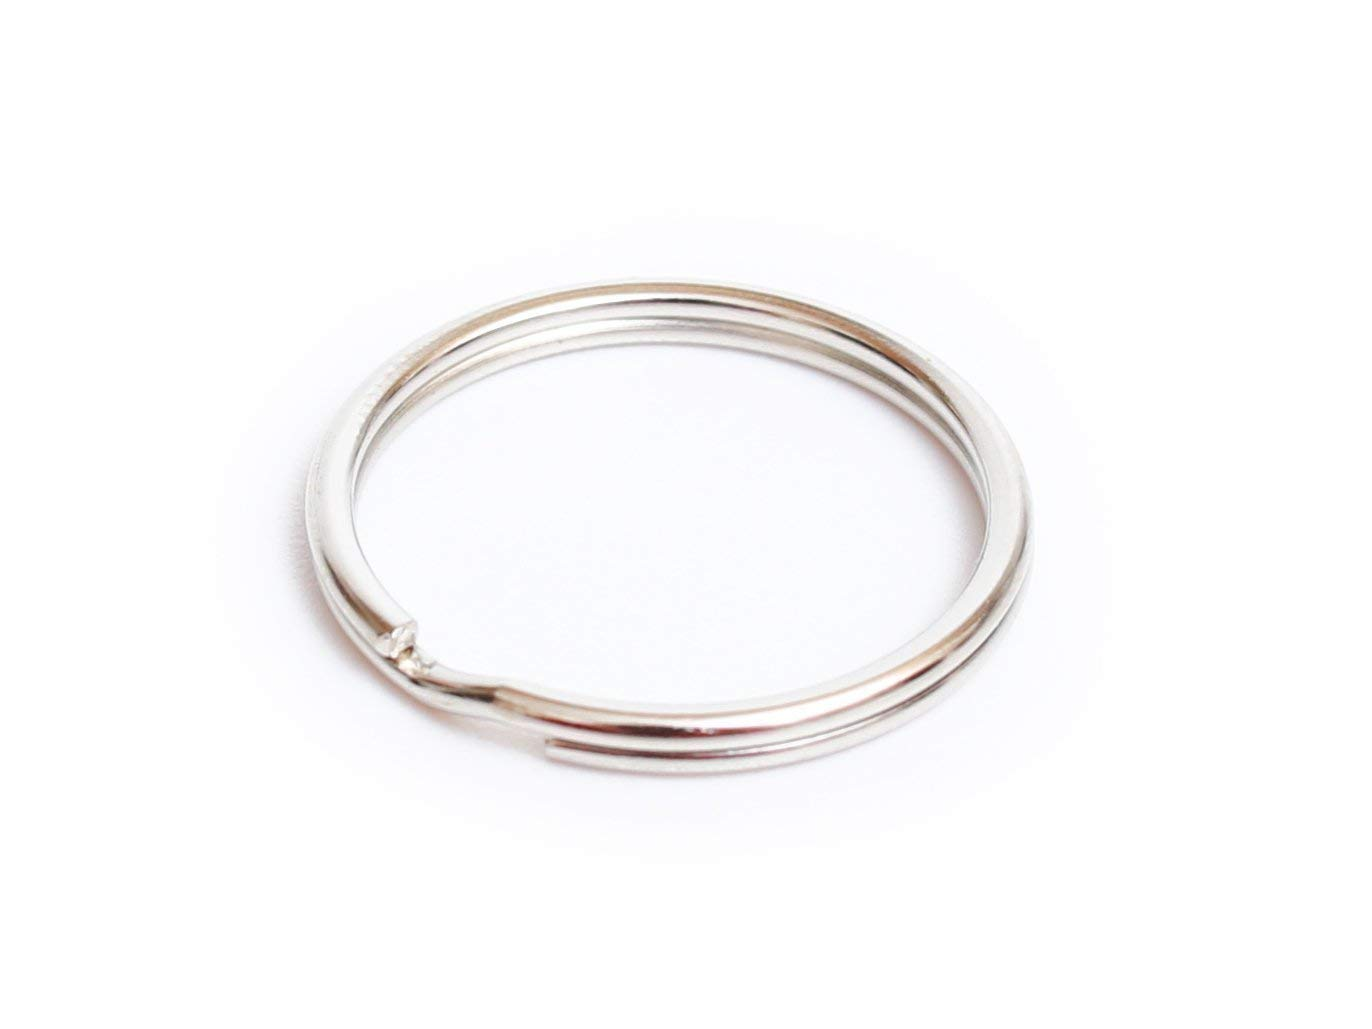 "50PCS Lead Free Nickel Plated Steel Round Split Ring Key Rings - Heat Treated for Strength - 1.2""(30mm) Diameter"